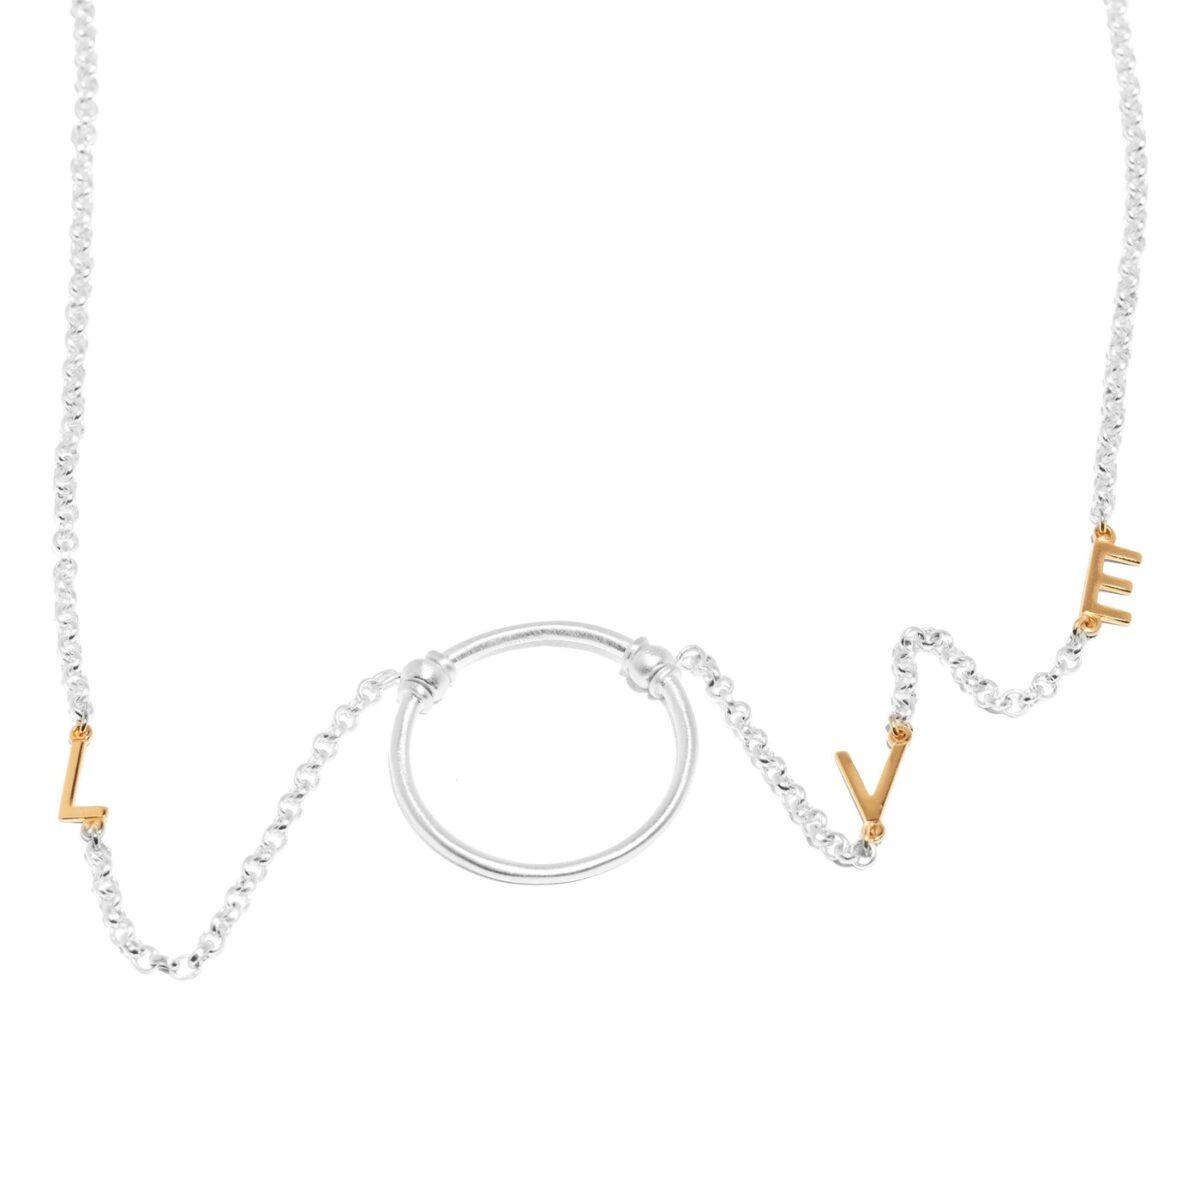 Love Letter eyeglass necklace by La Loop in Satin Silver